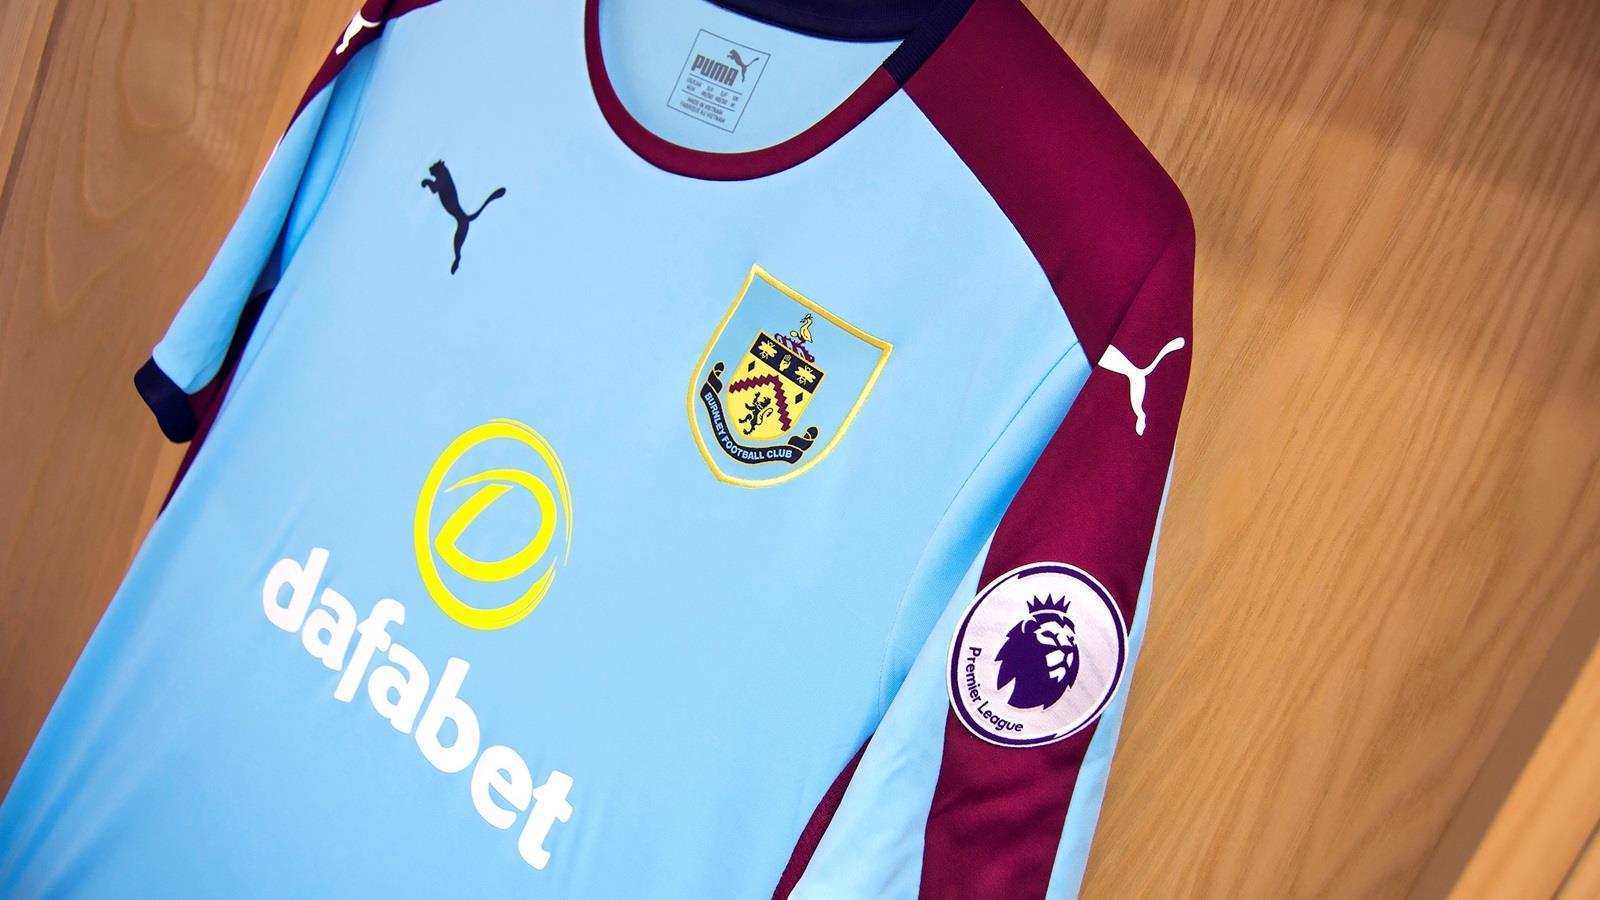 Burnley 2016-17 Away Kit Released